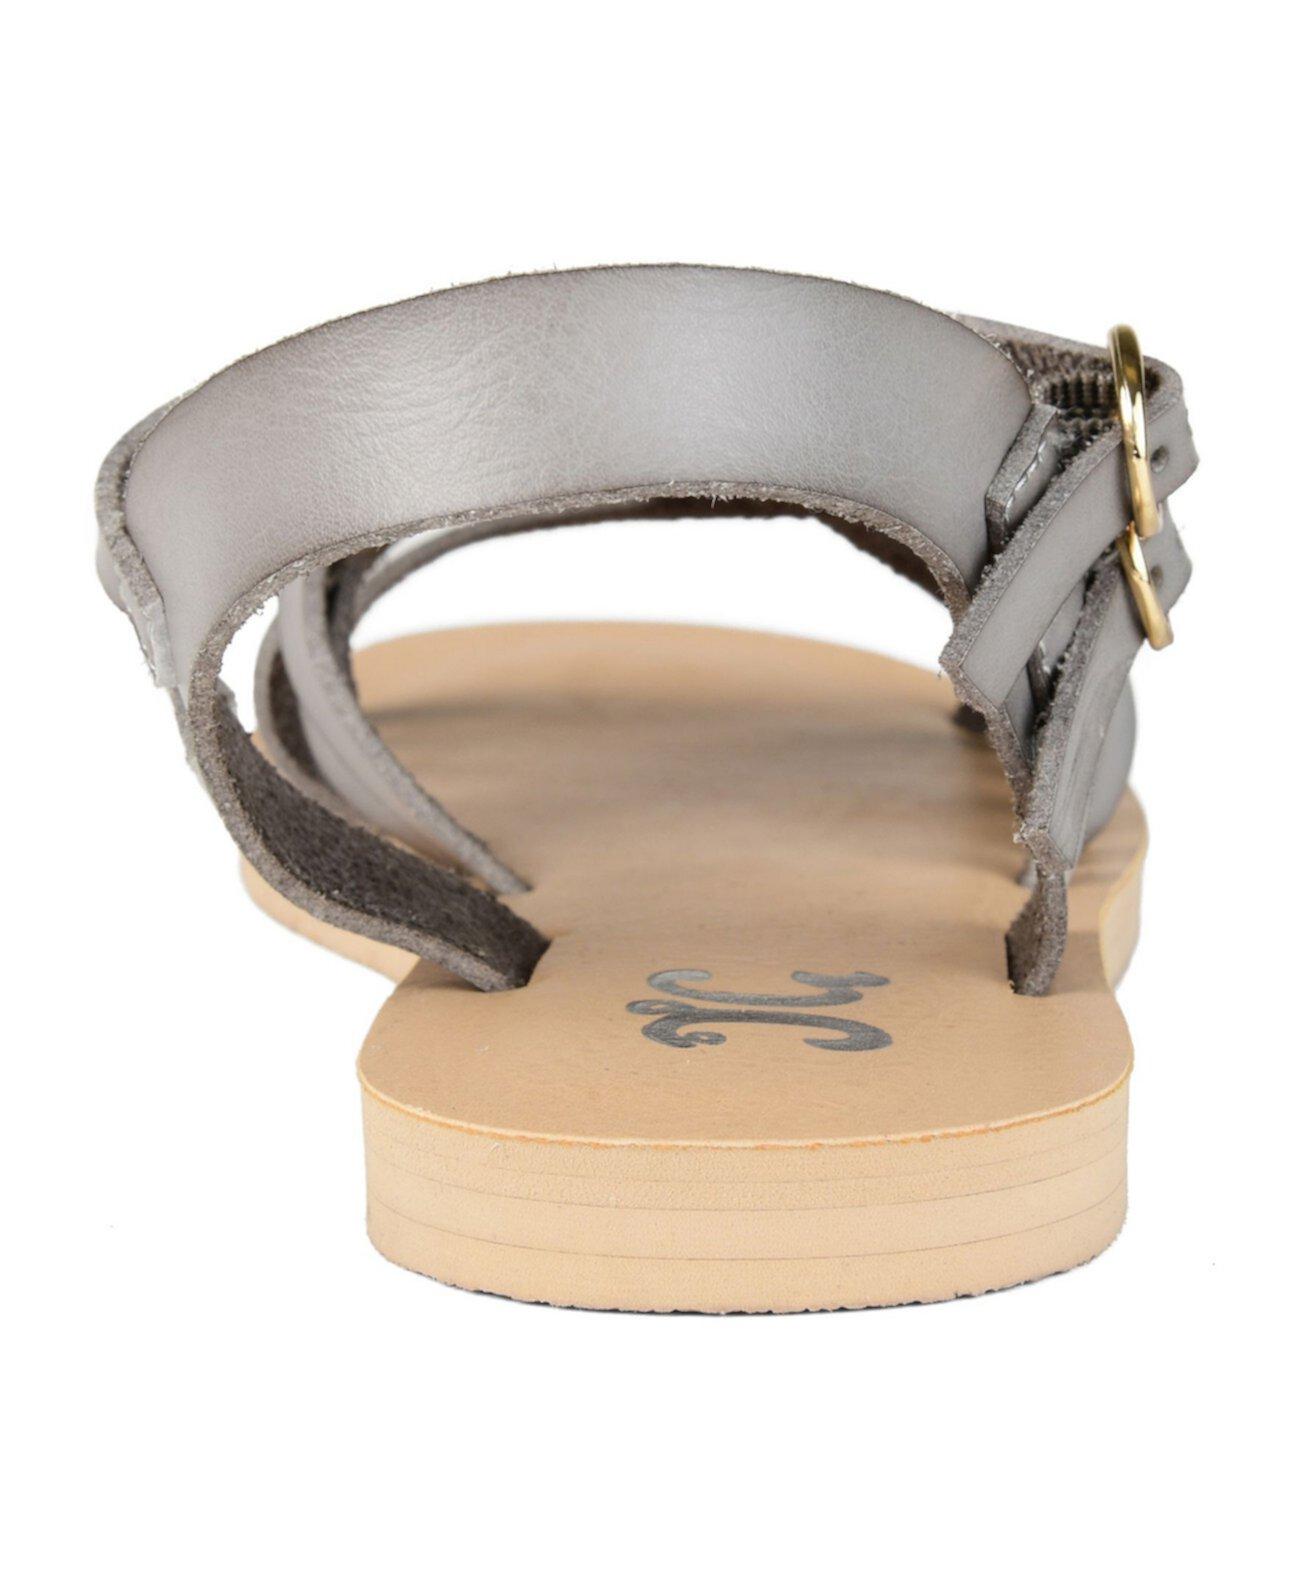 Женские сандалии Colby Journee Collection